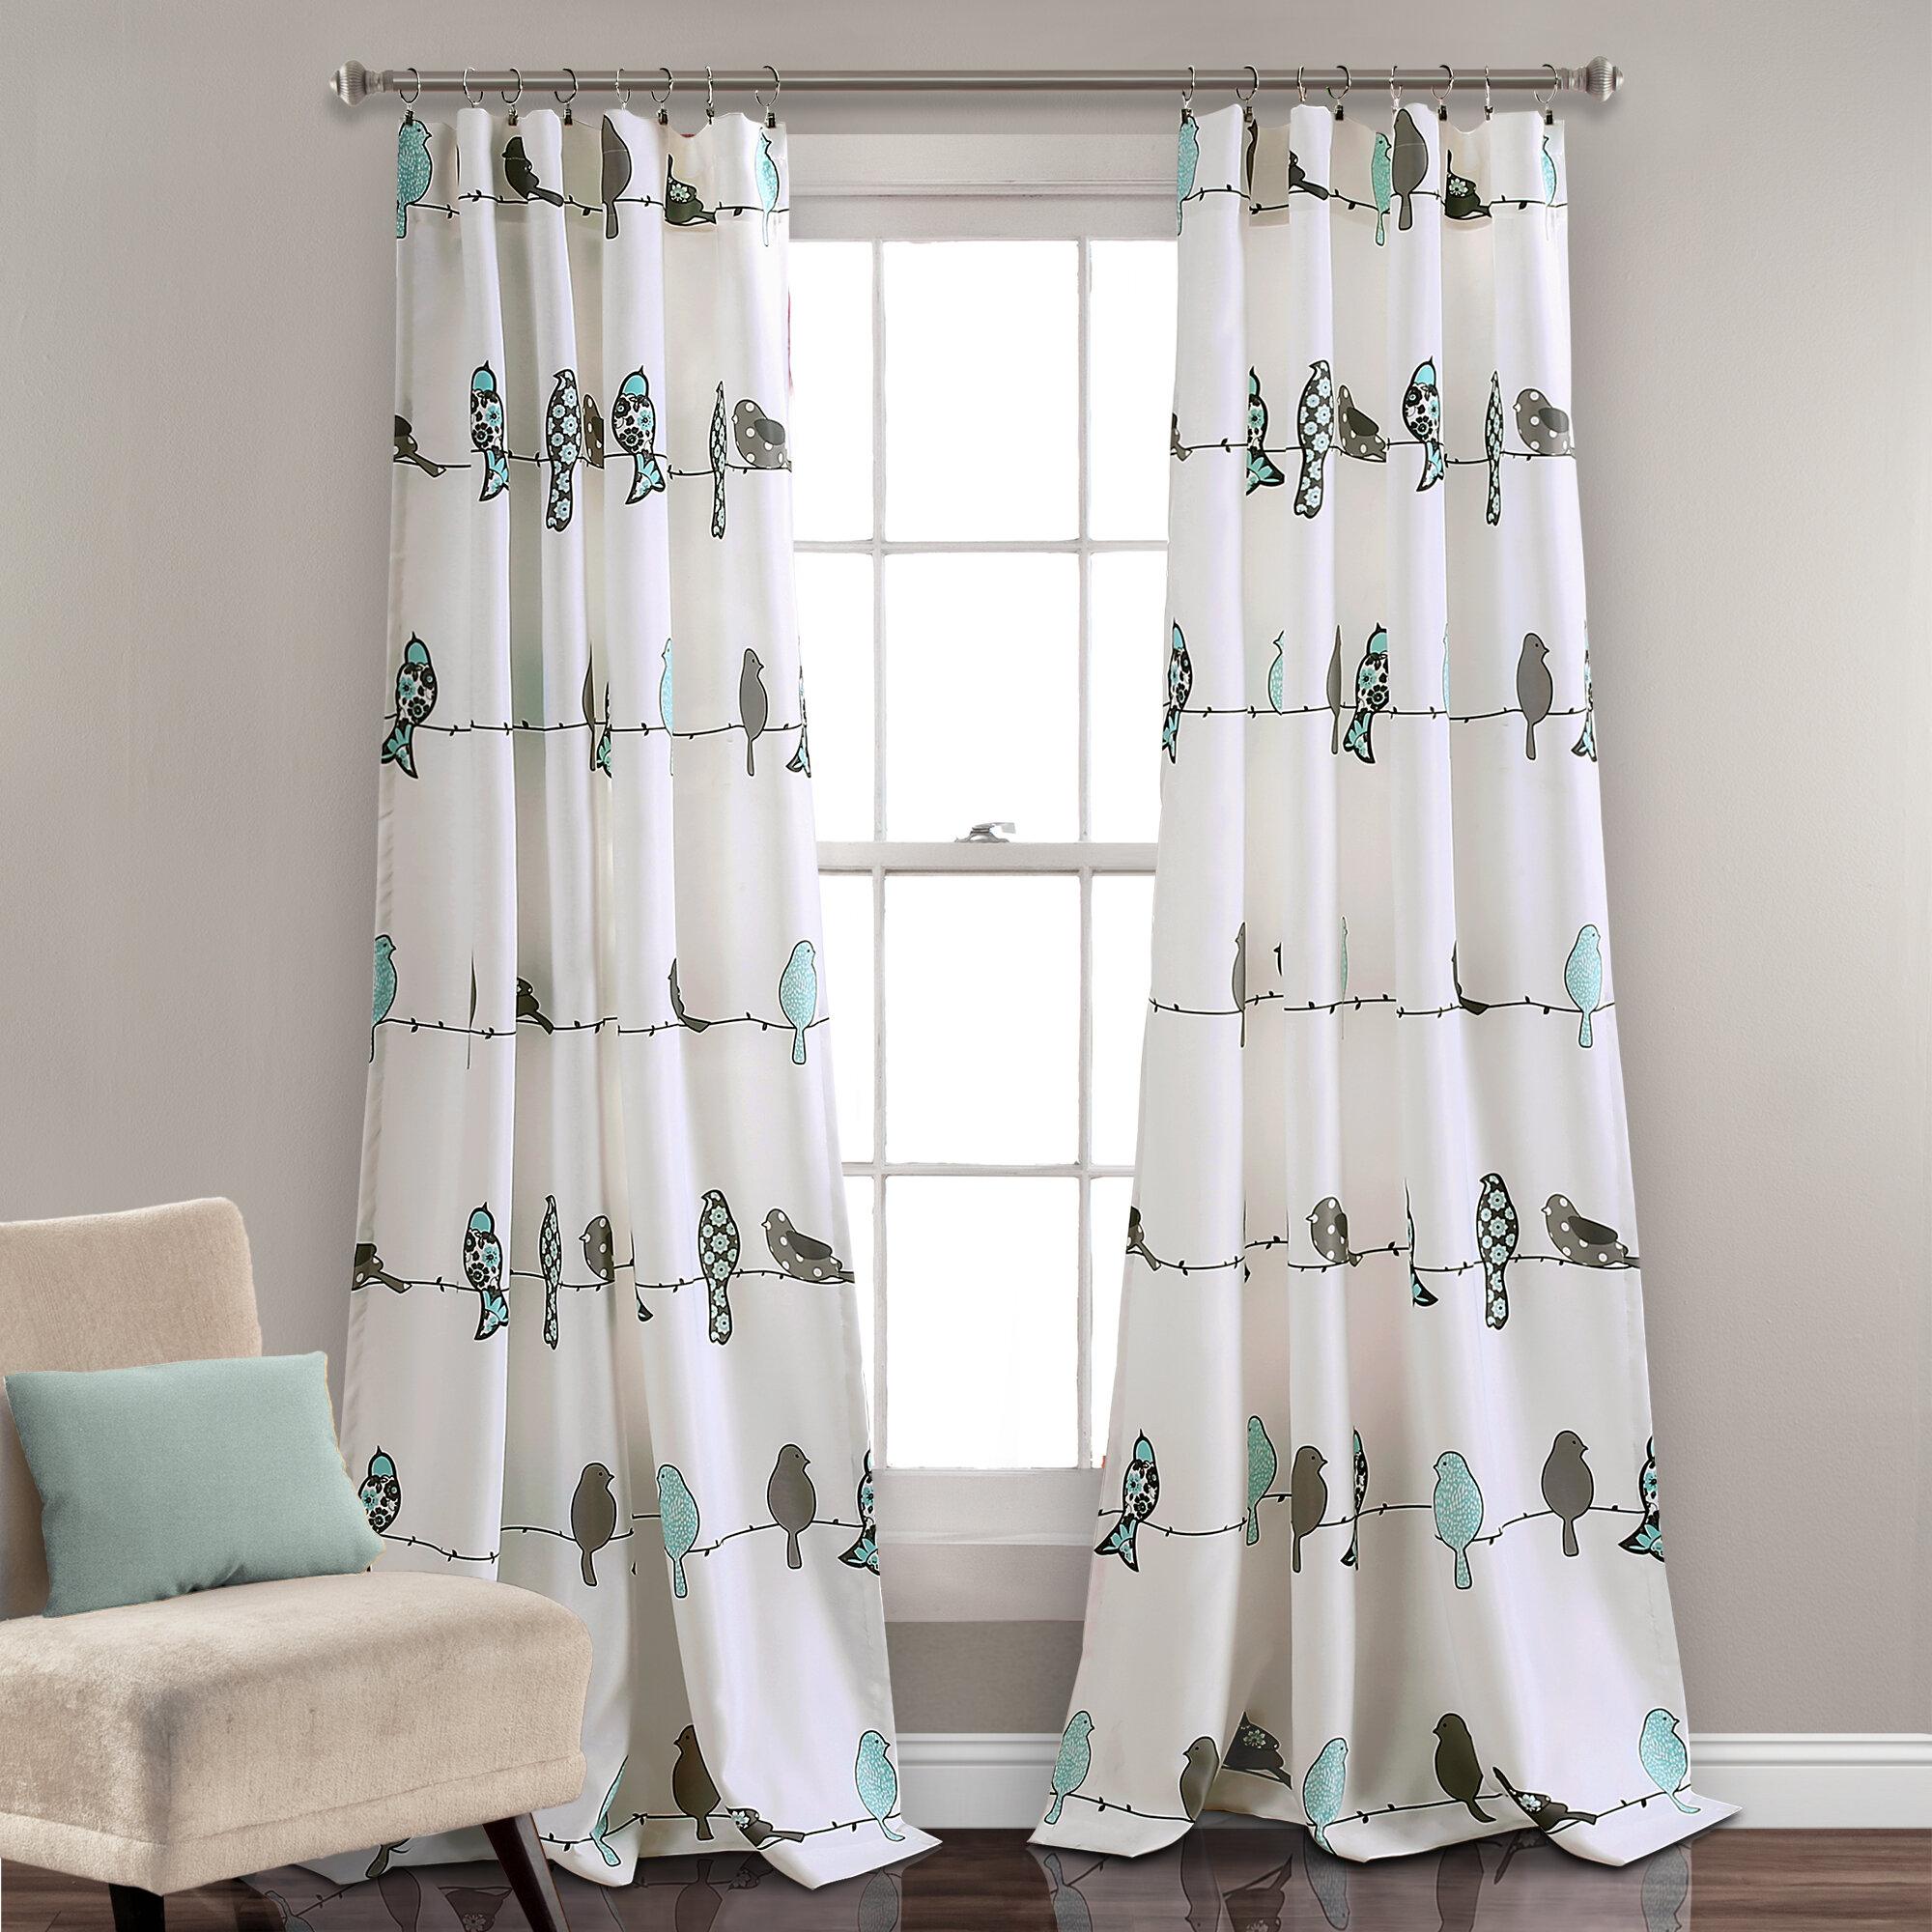 August Grove Recio Animal Print Room Darkening Rod Pocket Curtain Panels Reviews Wayfair